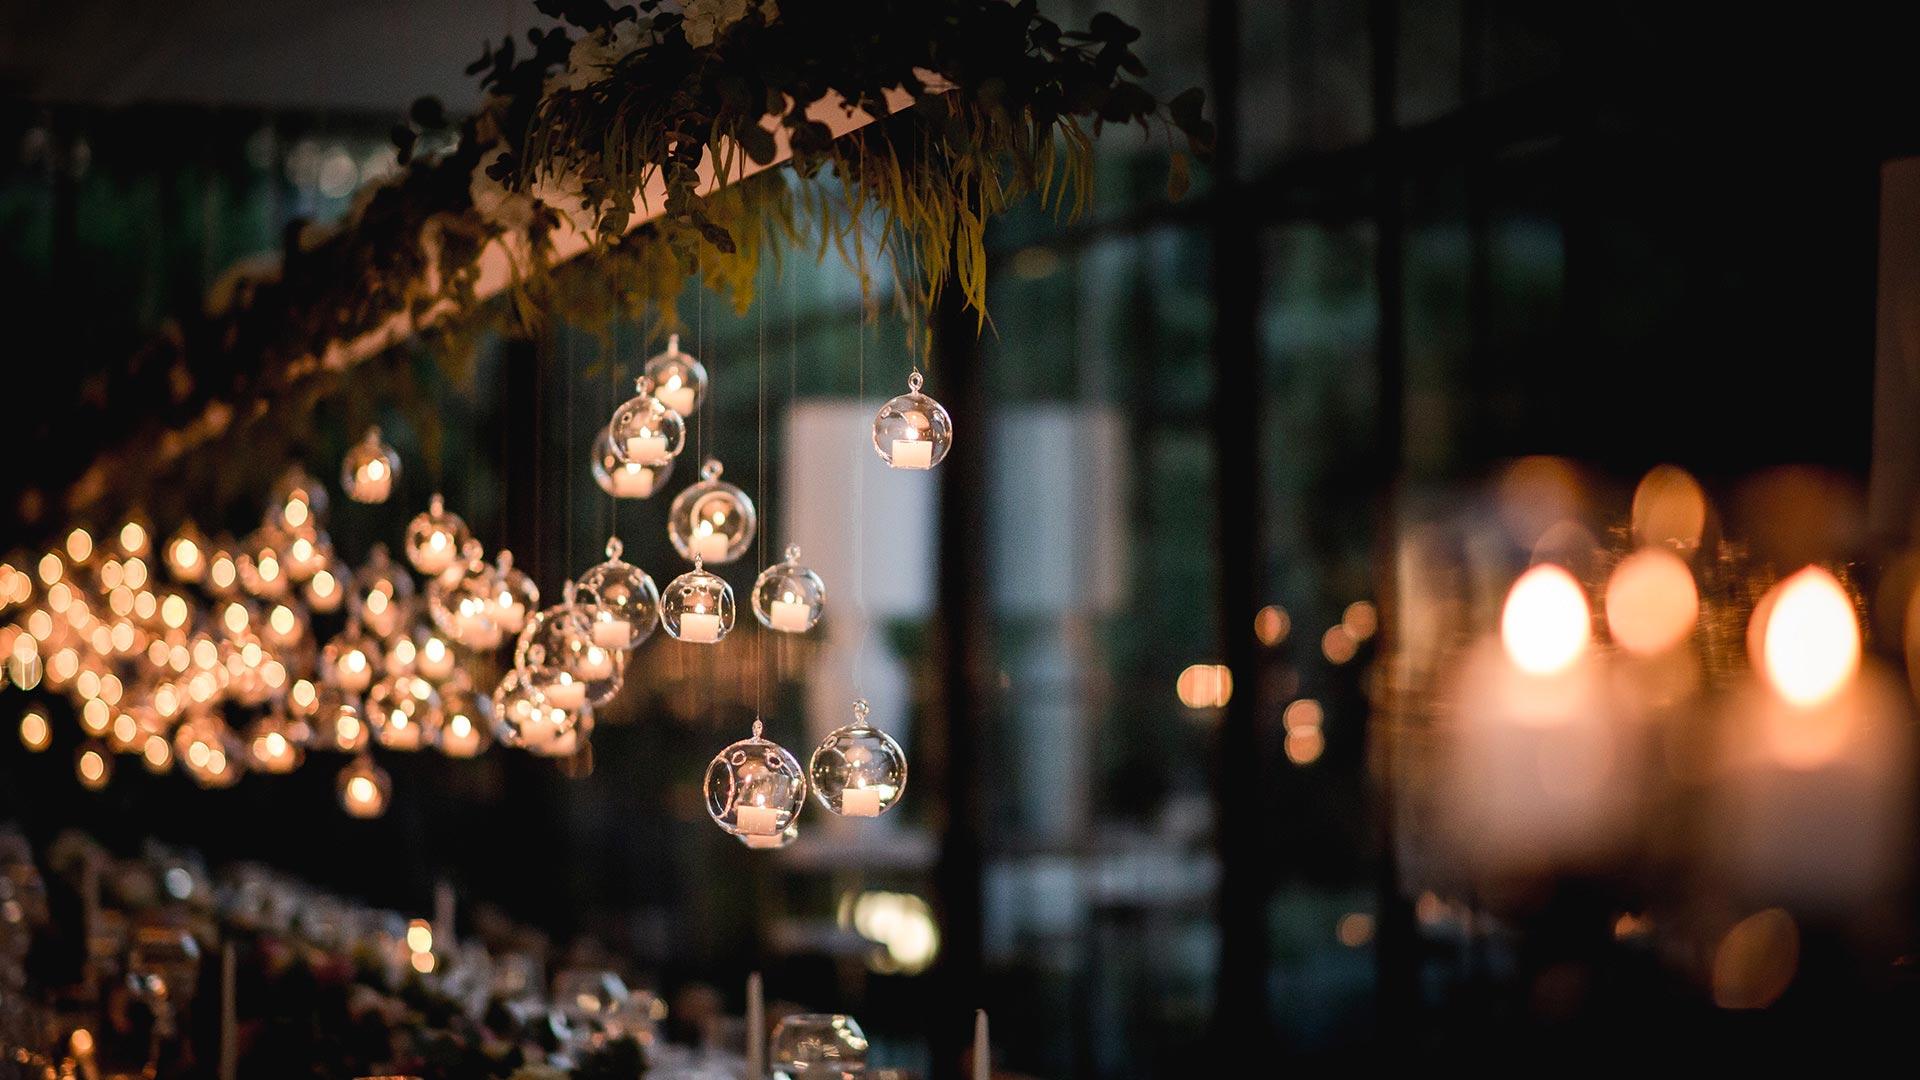 matrimonio autunnale candele